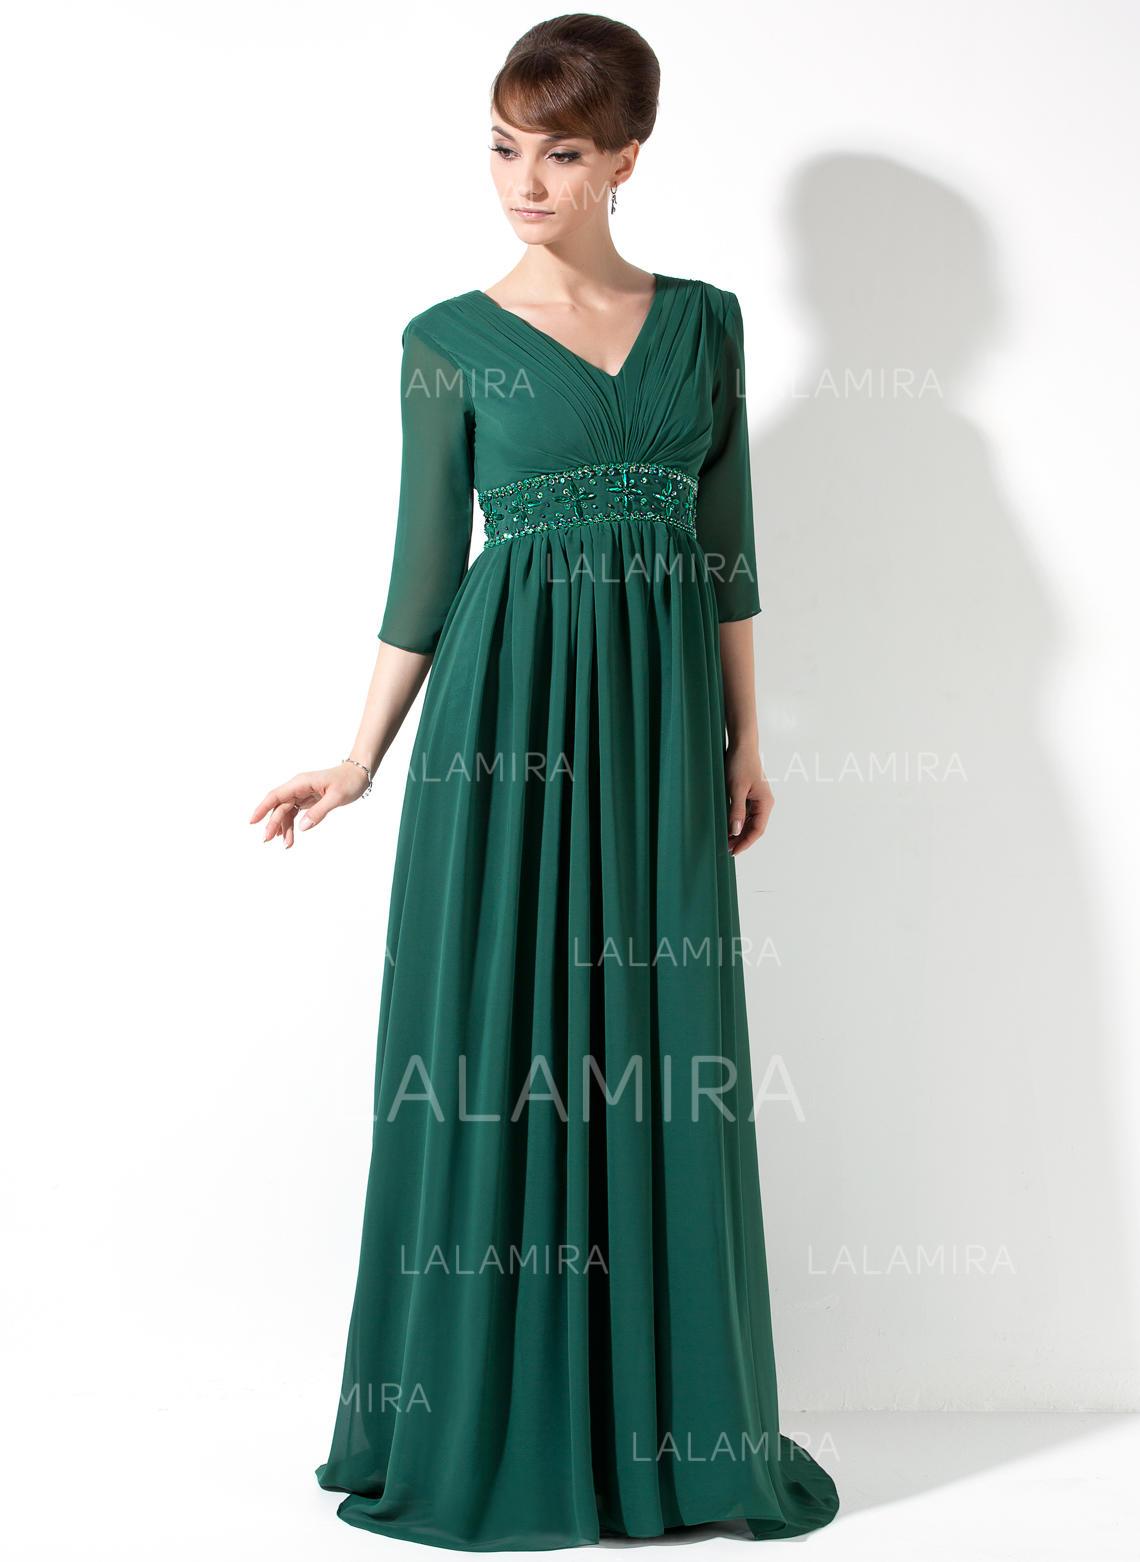 1706fb0660104 Empire Chiffon Prom Dresses Ruffle Beading Sequins V-neck 3/4 Sleeves Sweep  Train. Loading zoom